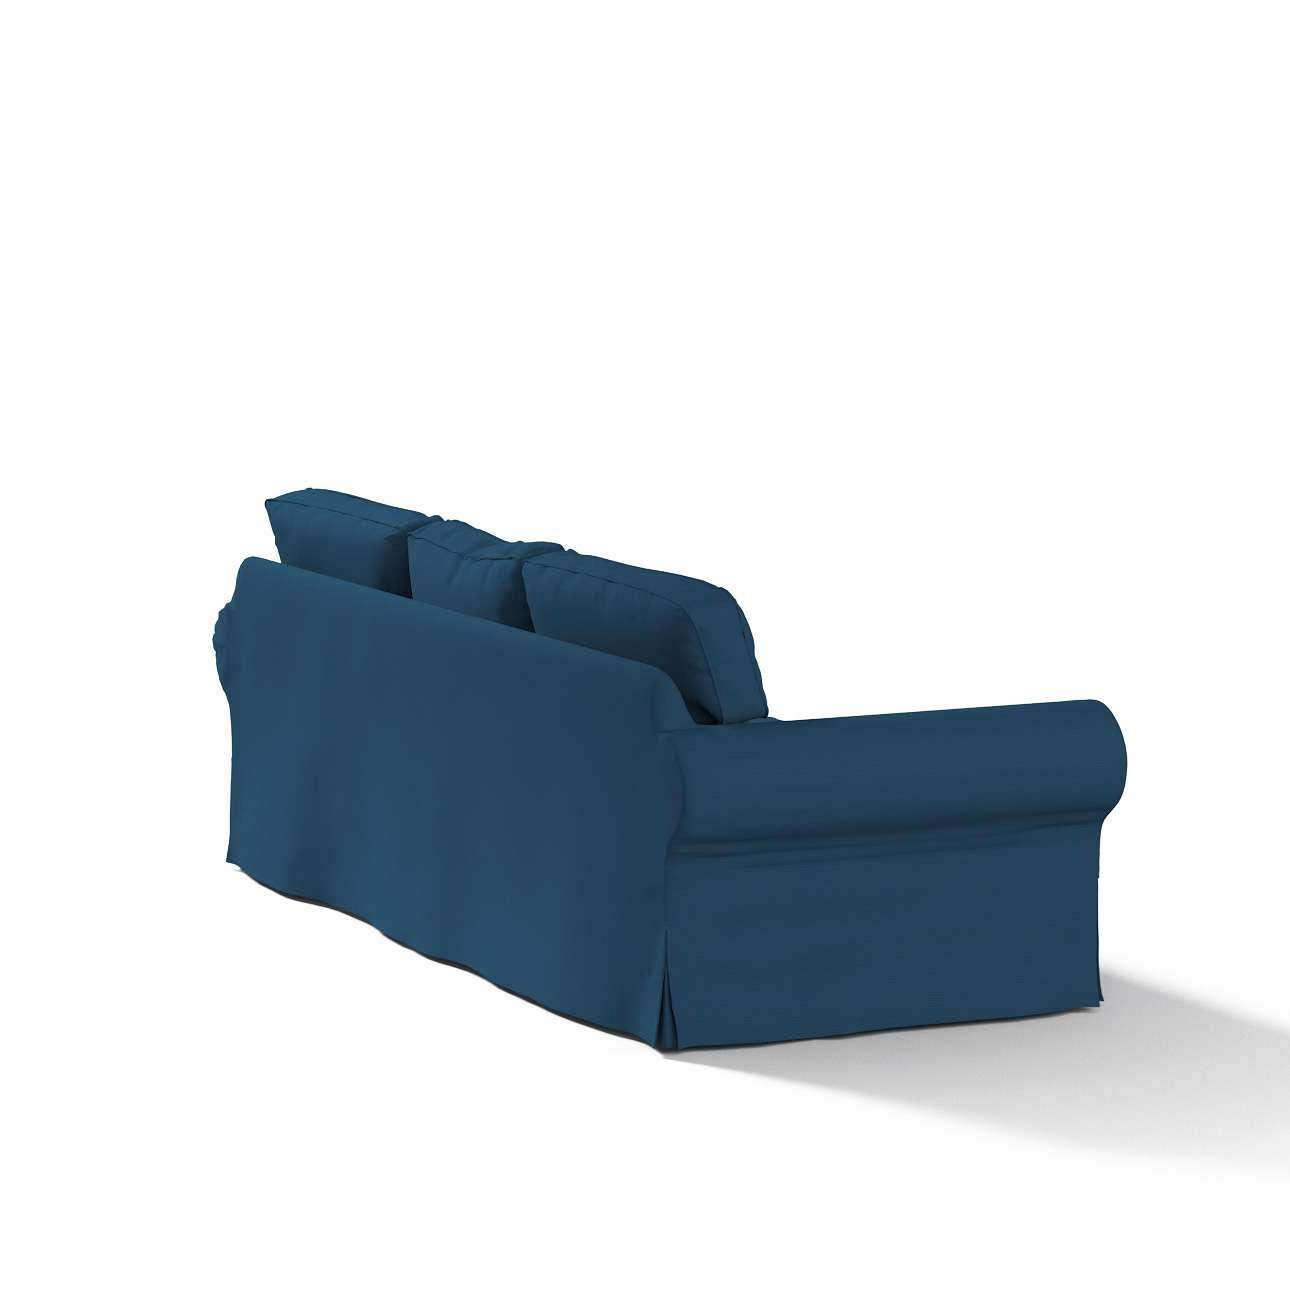 Ektorp 3-Sitzer Schlafsofabezug neues Modell (2013) Ektorp 3-Sitzer, ausklappbar, neues Modell ( 2013) von der Kollektion Cotton Panama, Stoff: 702-30